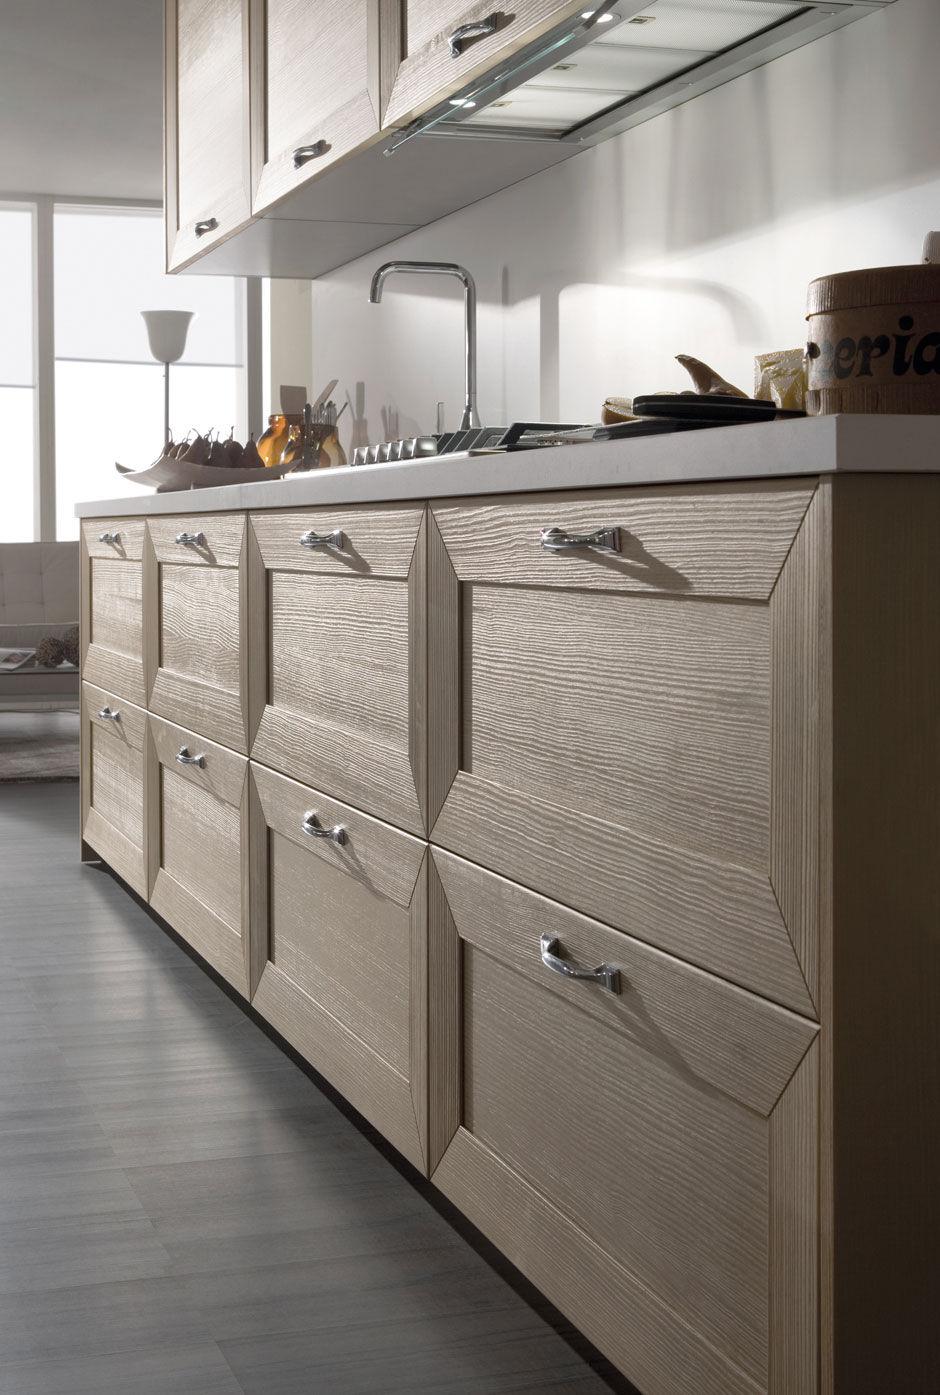 Stunning Del Tongo Cucina Images - Home Interior Ideas - hollerbach.us